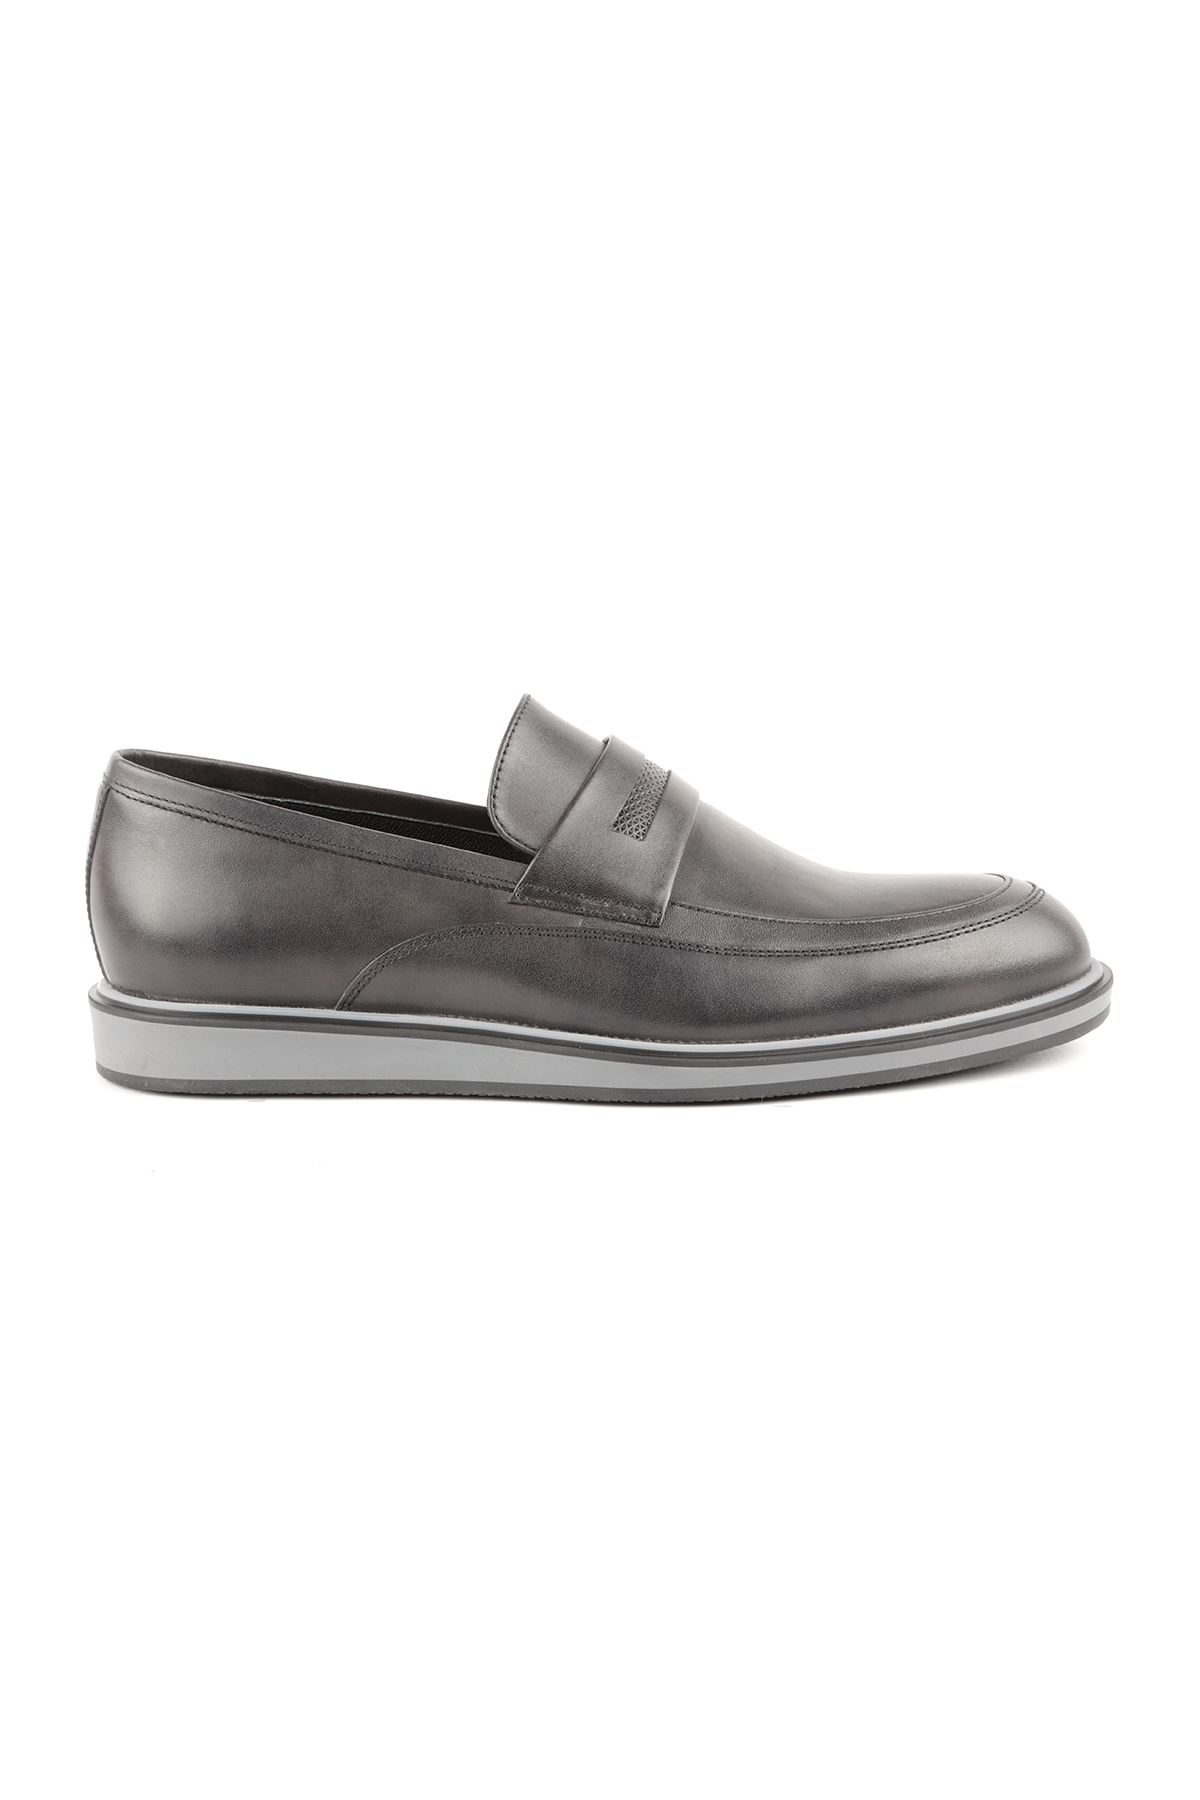 Libero L3668 Black Loafer Men's Shoes